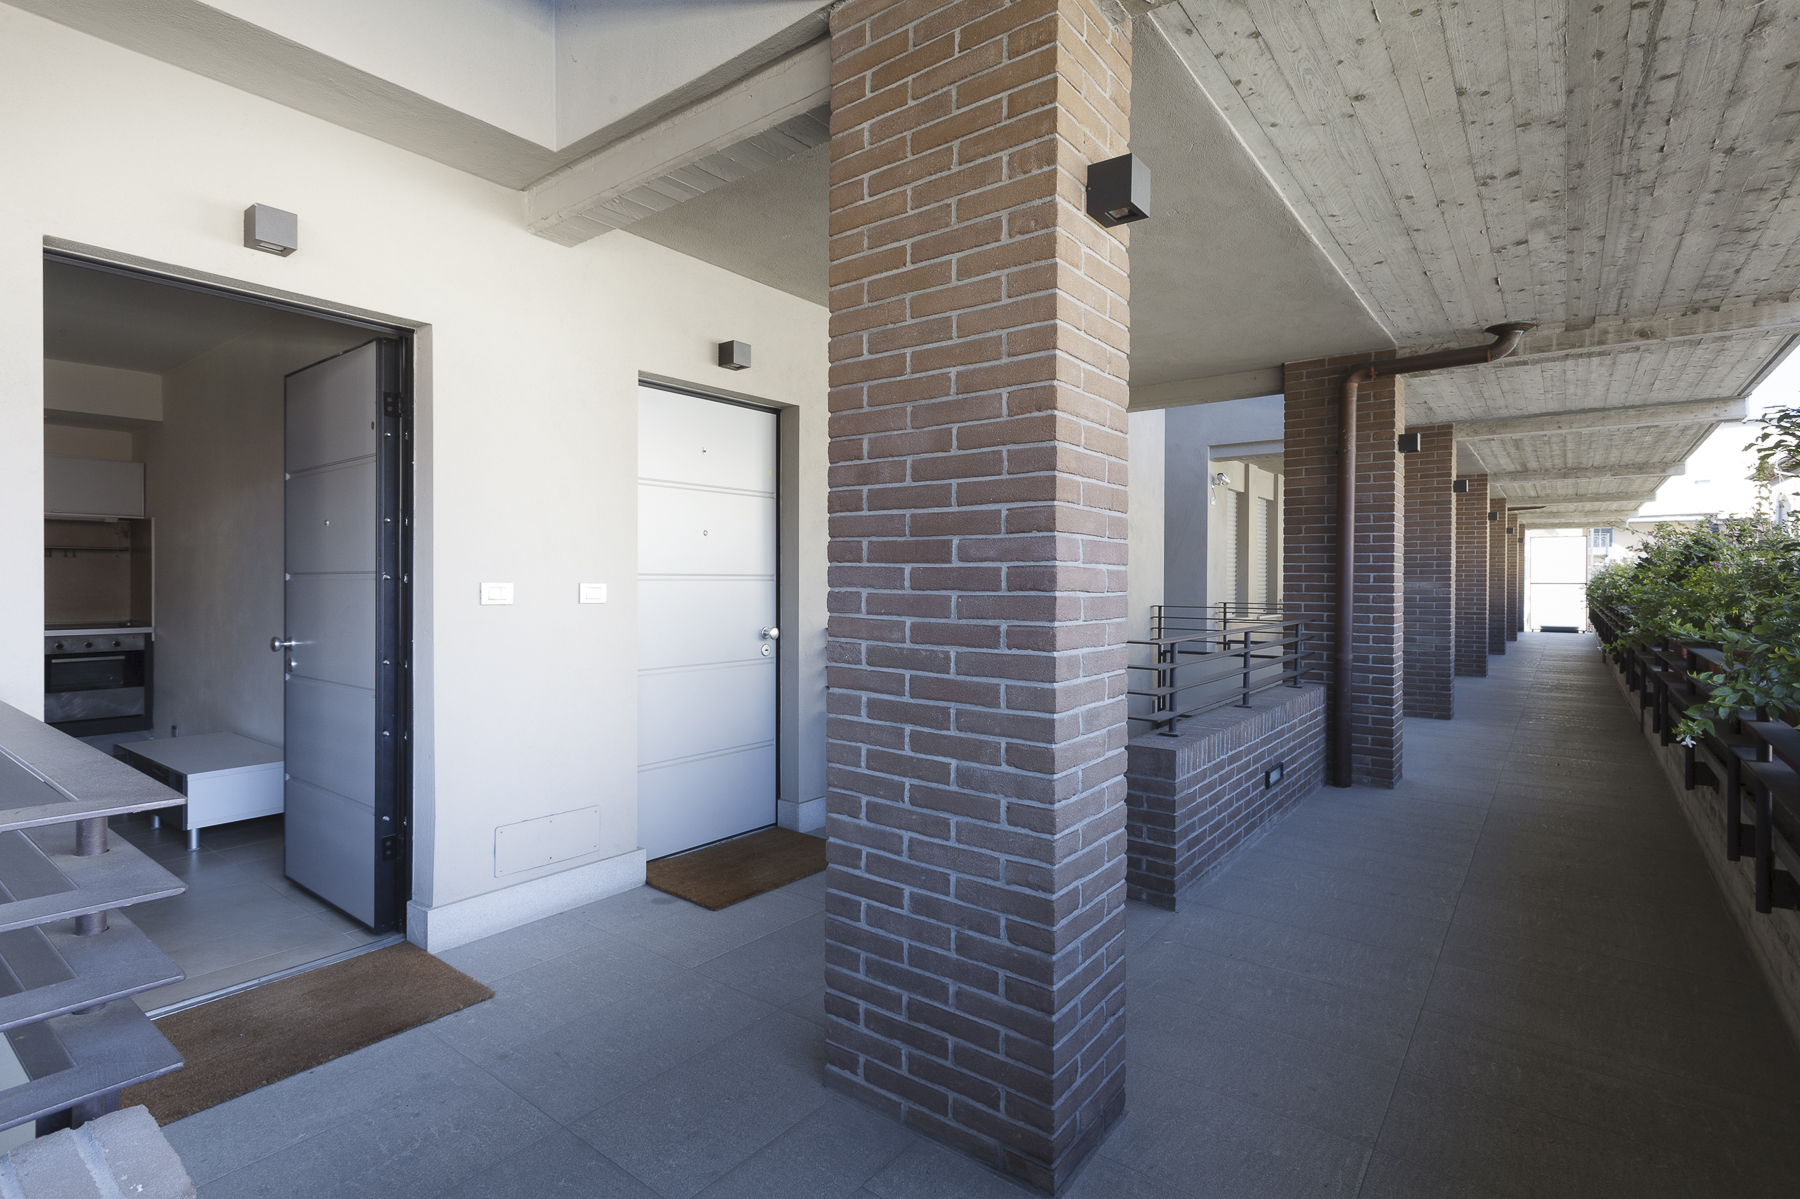 Additional photo for property listing at Appartamento rifinito modernamente Via Sciolze Turin, Torino 10132 Italia